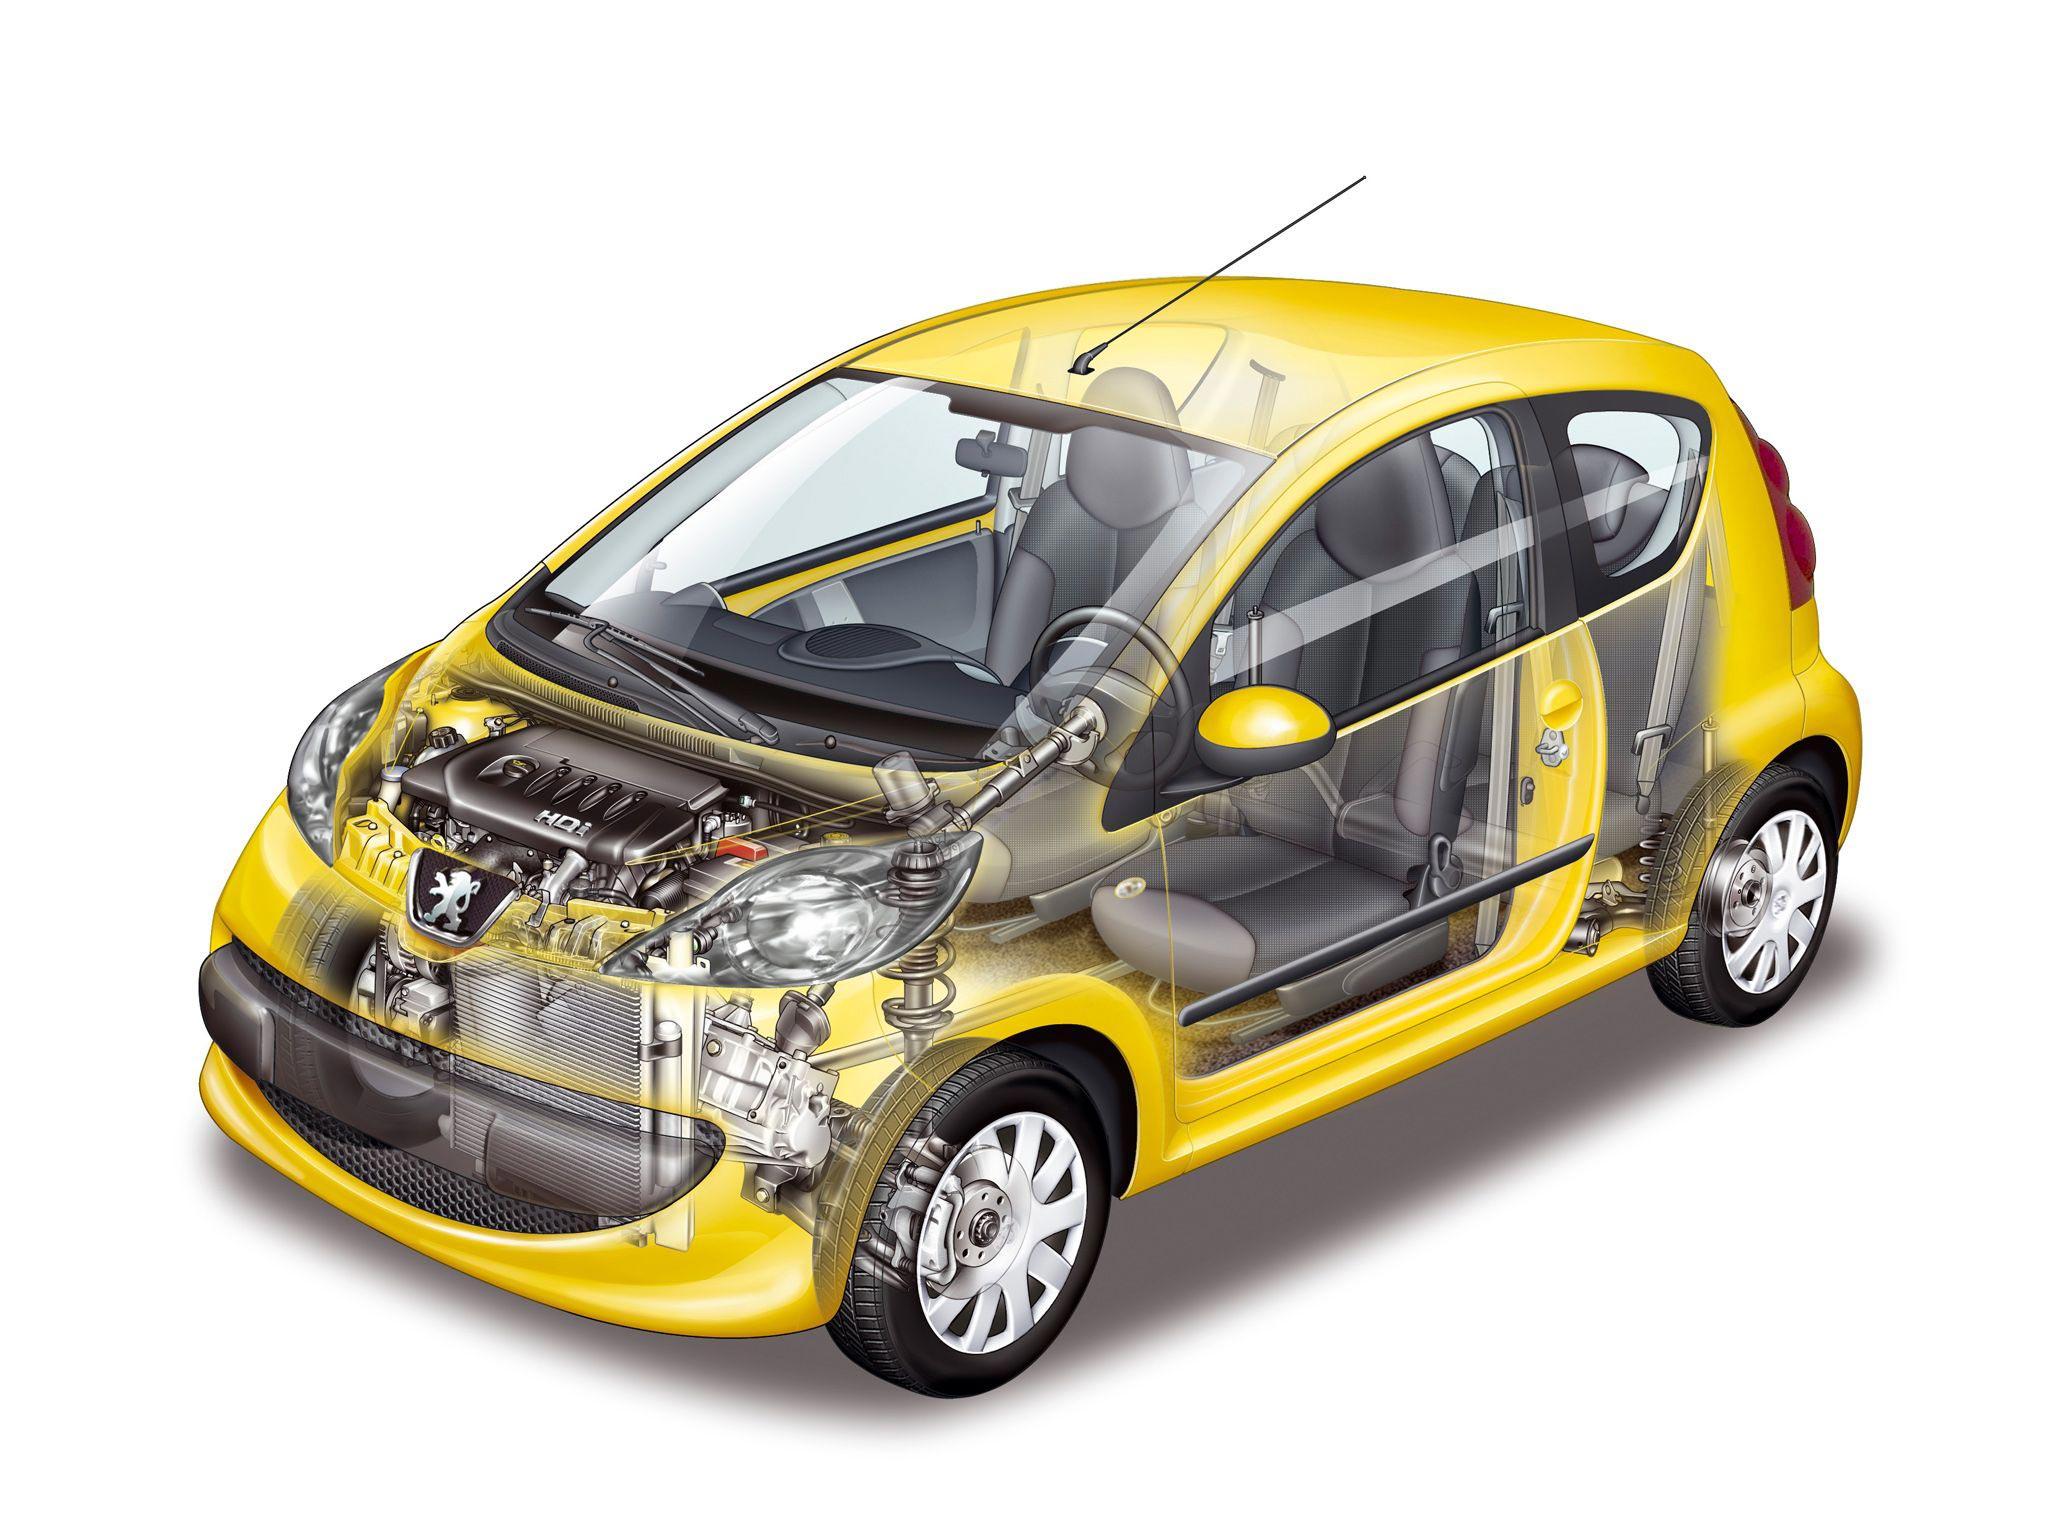 Peugeot 107 cutaway drawing